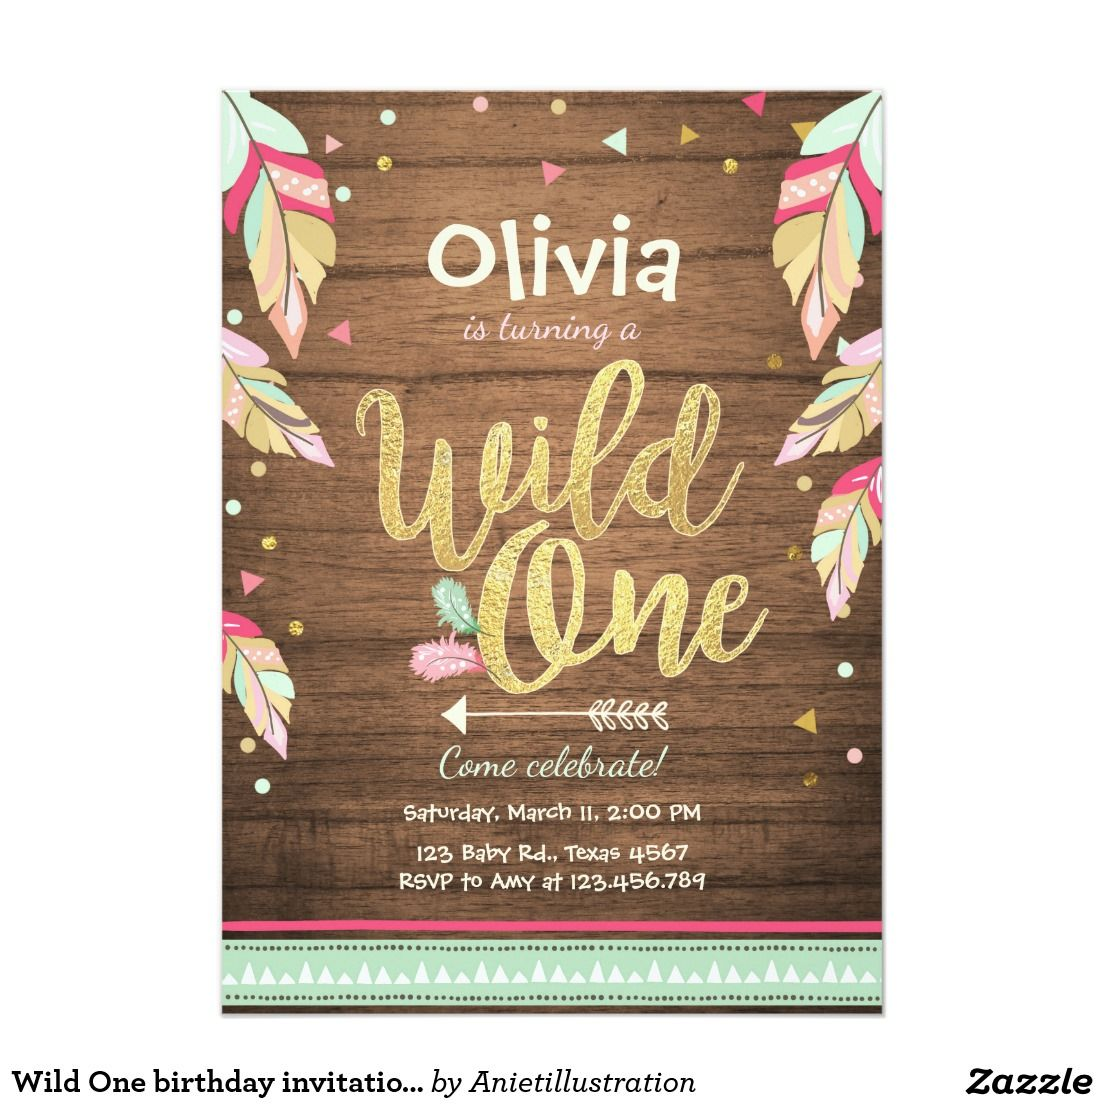 Wild One birthday invitation First birthday Girl | Pinterest ...